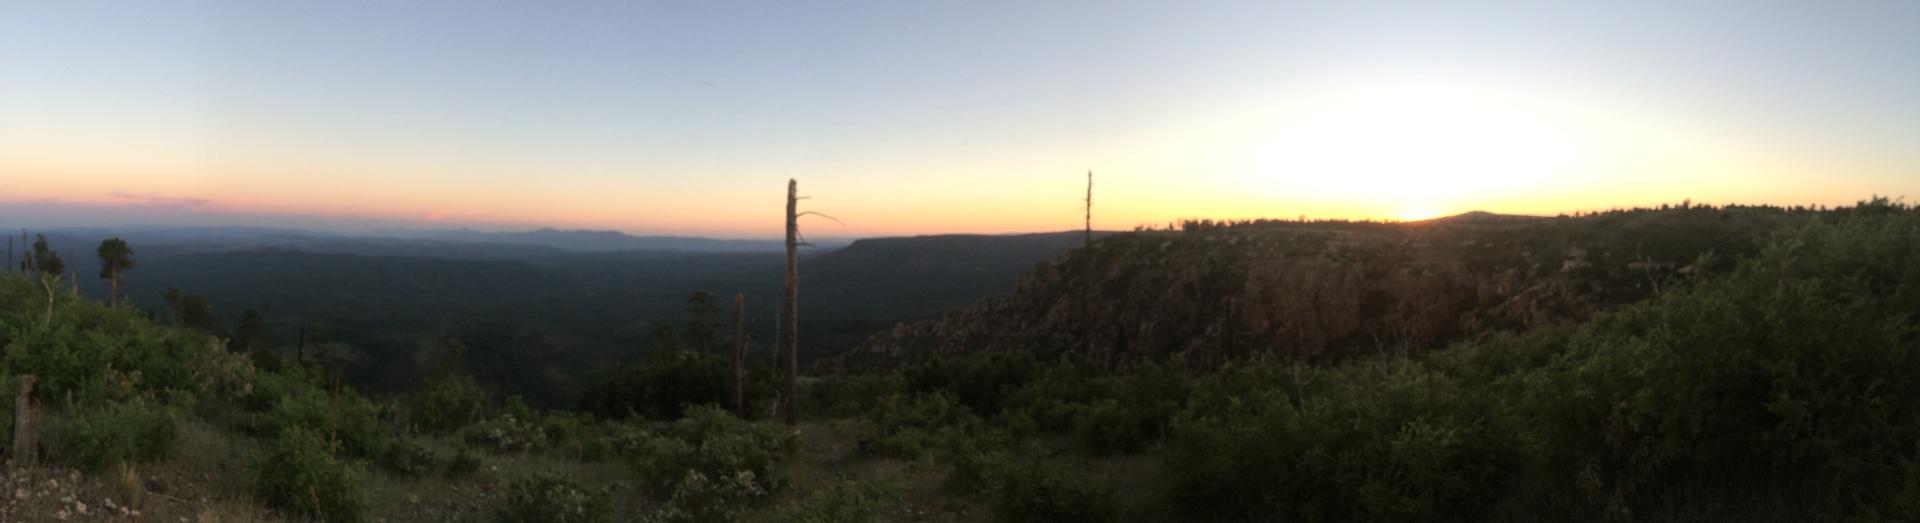 donohue trail mogollon rim hiking